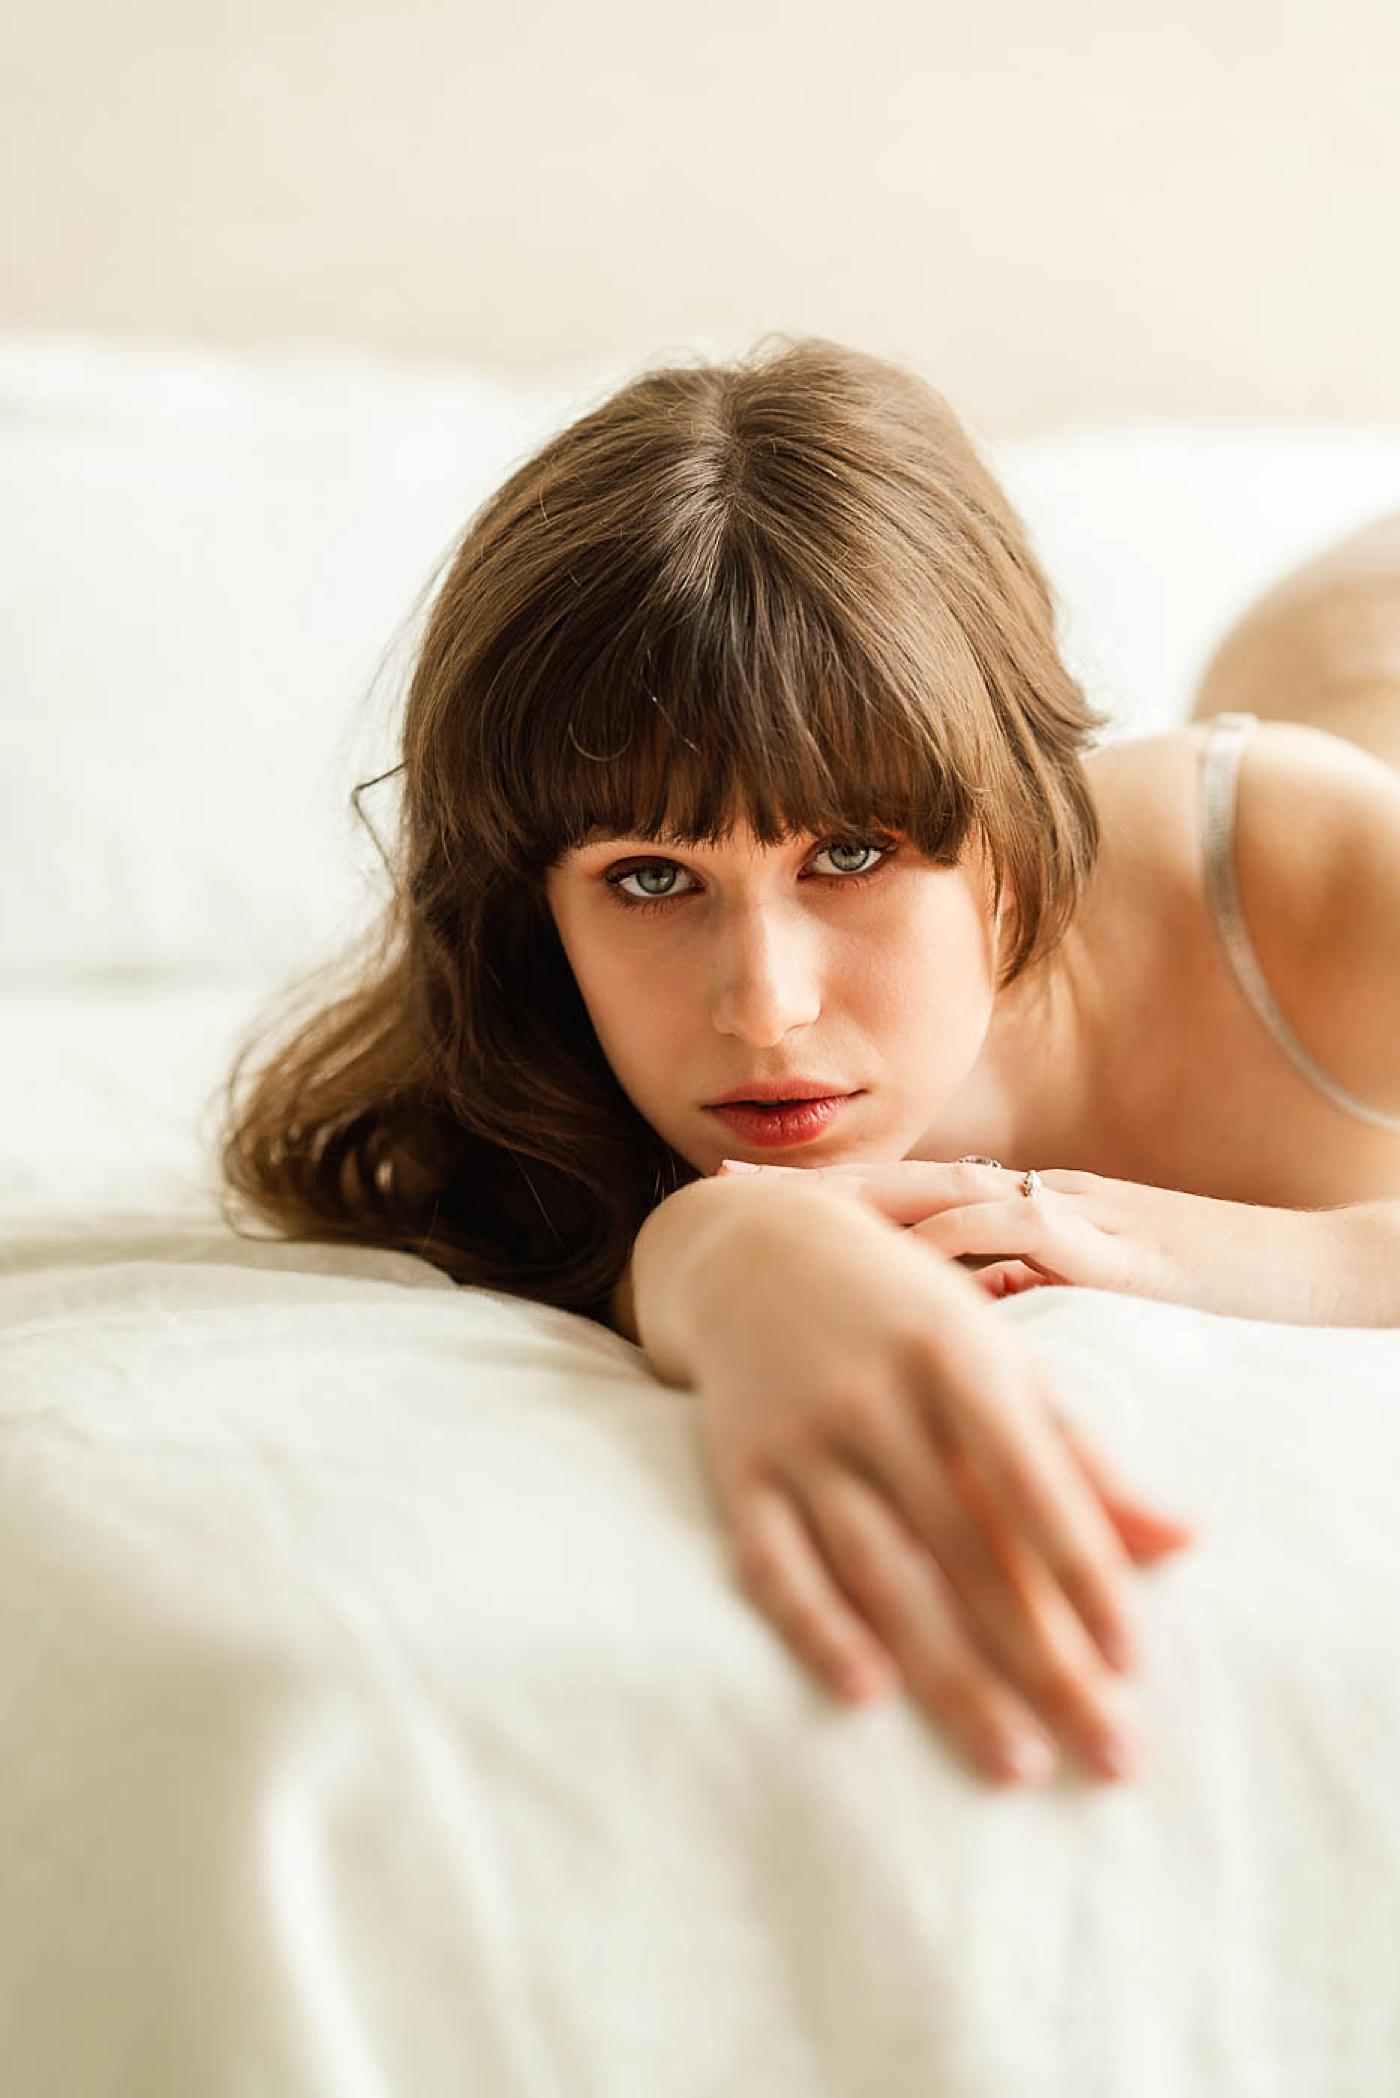 boudoir_photoshoot_austin_tx_0498.jpg